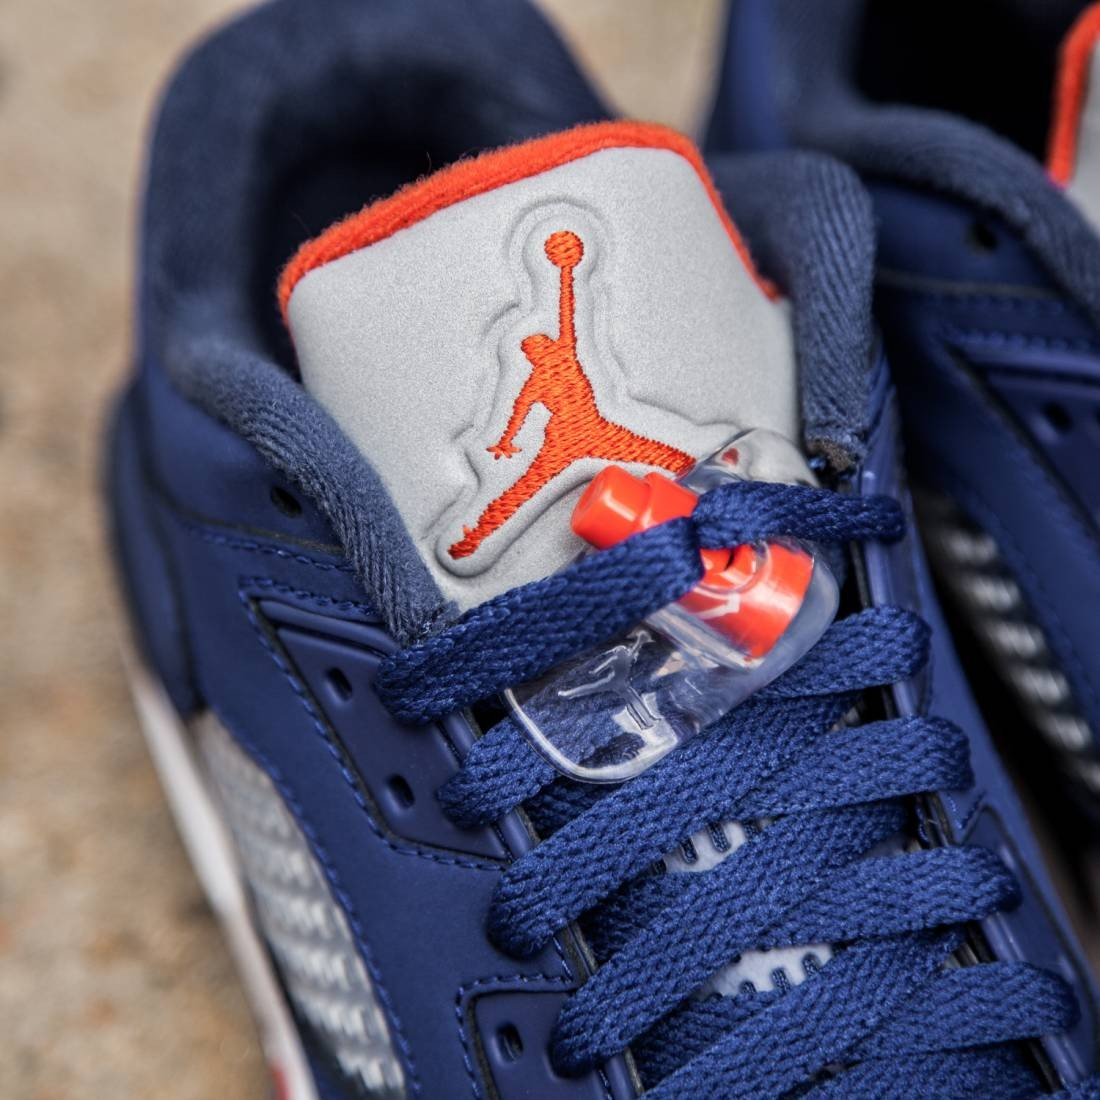 c28032f7b454 Air Jordan 5 Retro Low Knicks (GS) Big Kids (deep royal blue midnight  navy white team orange)